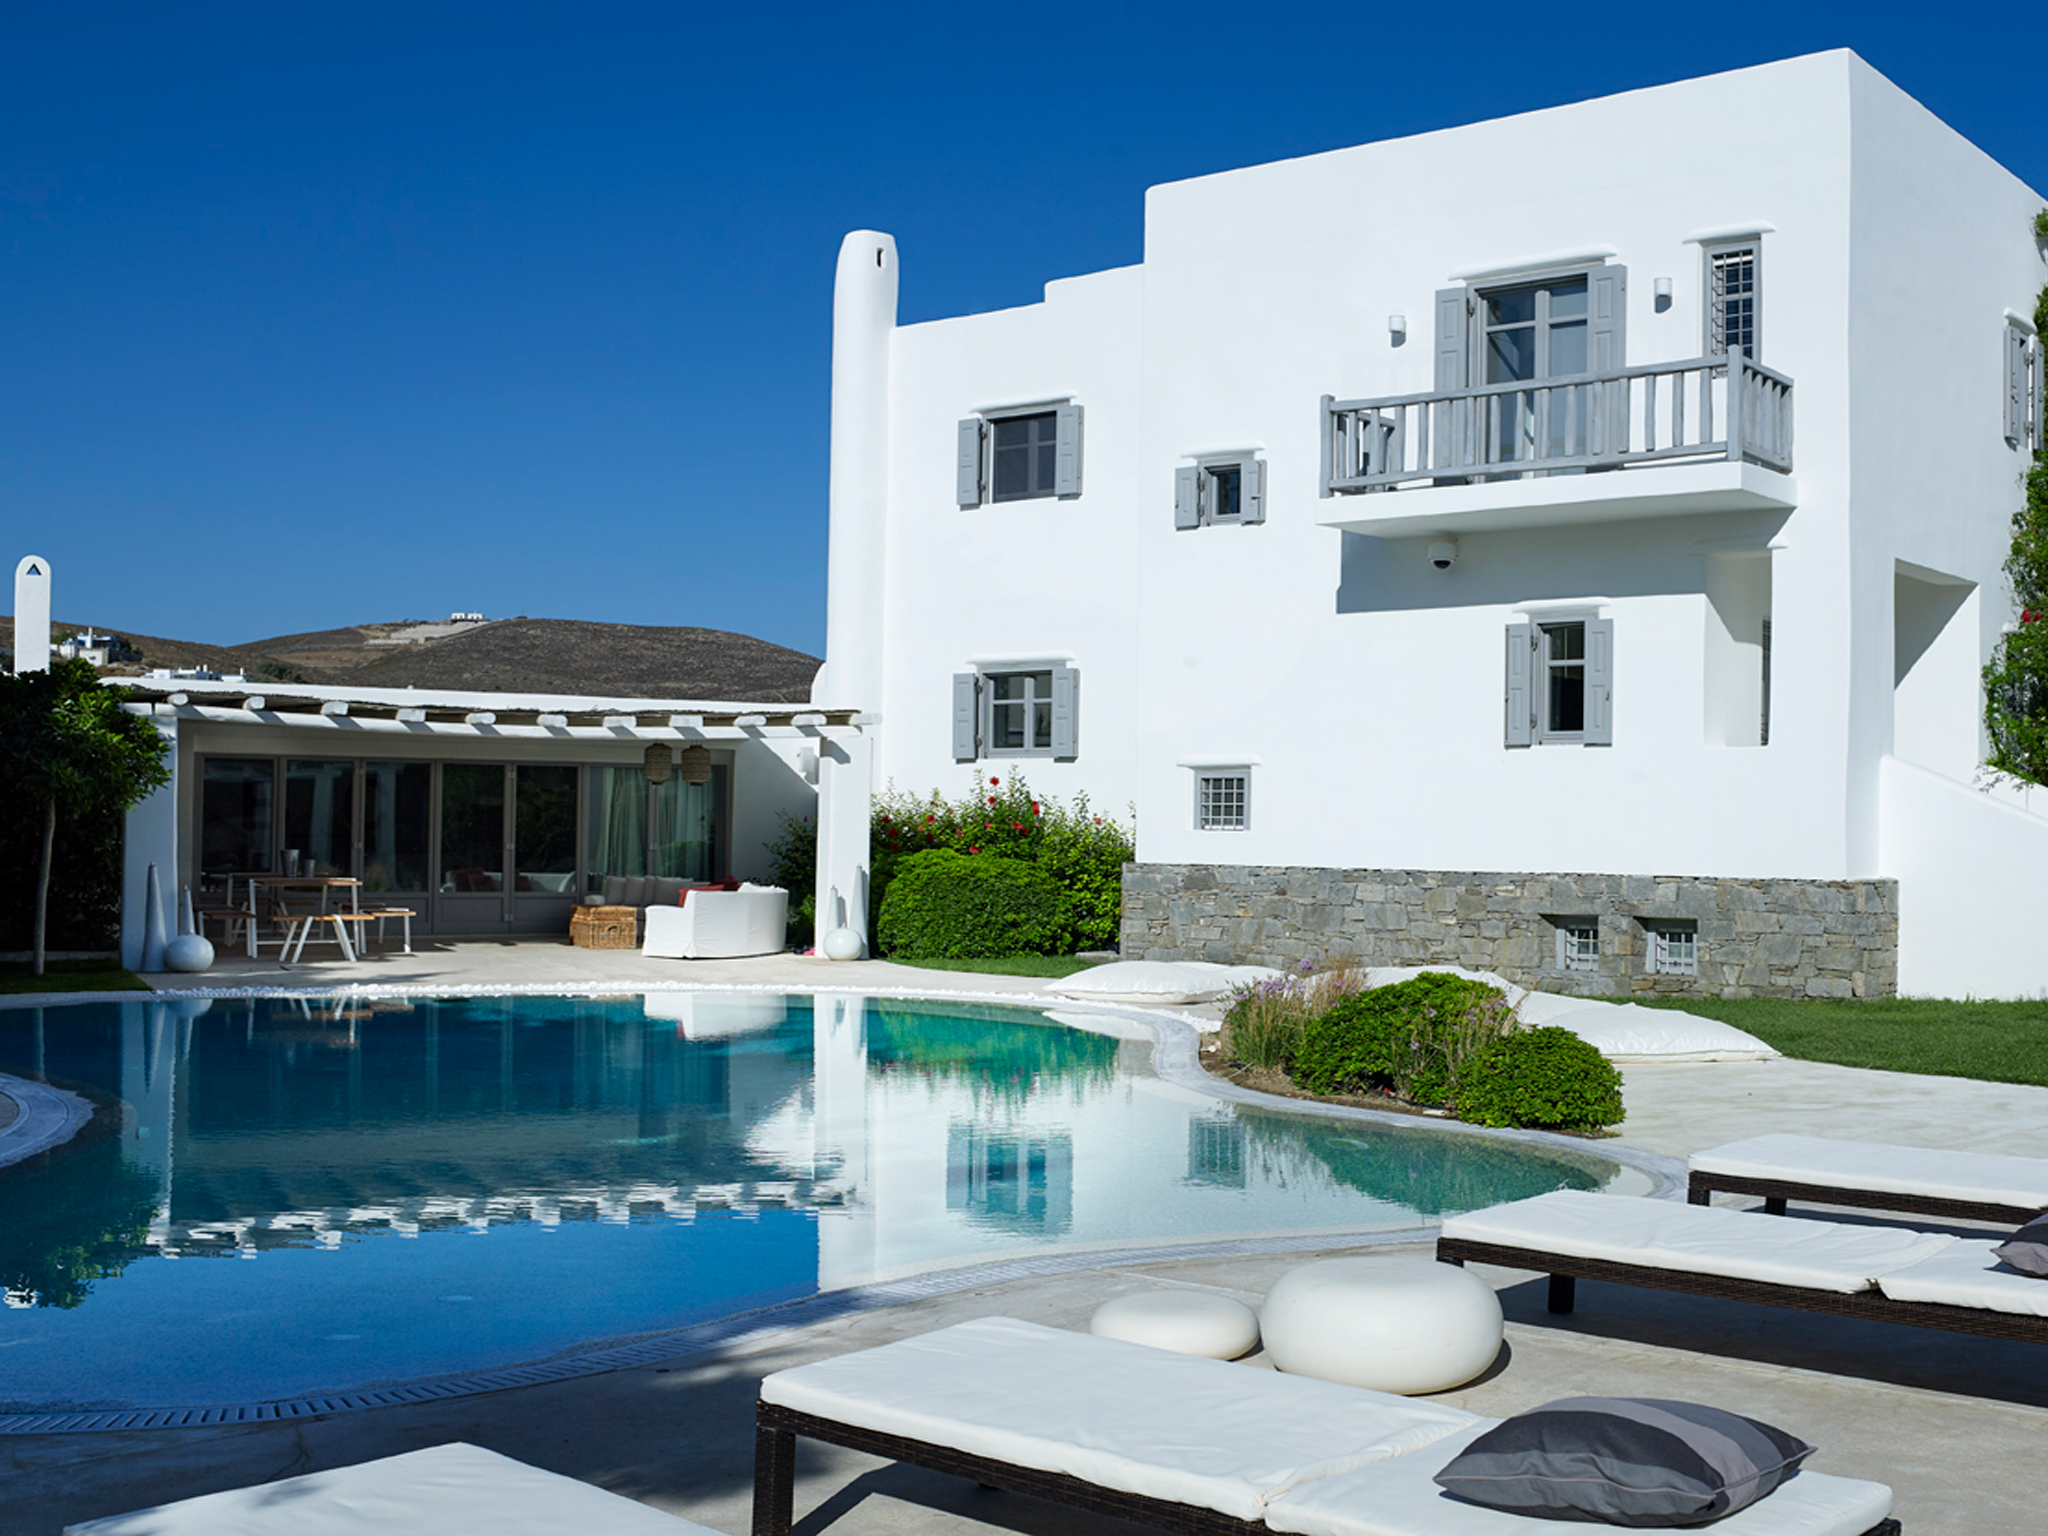 Syros Villa Niovi jumbotron image